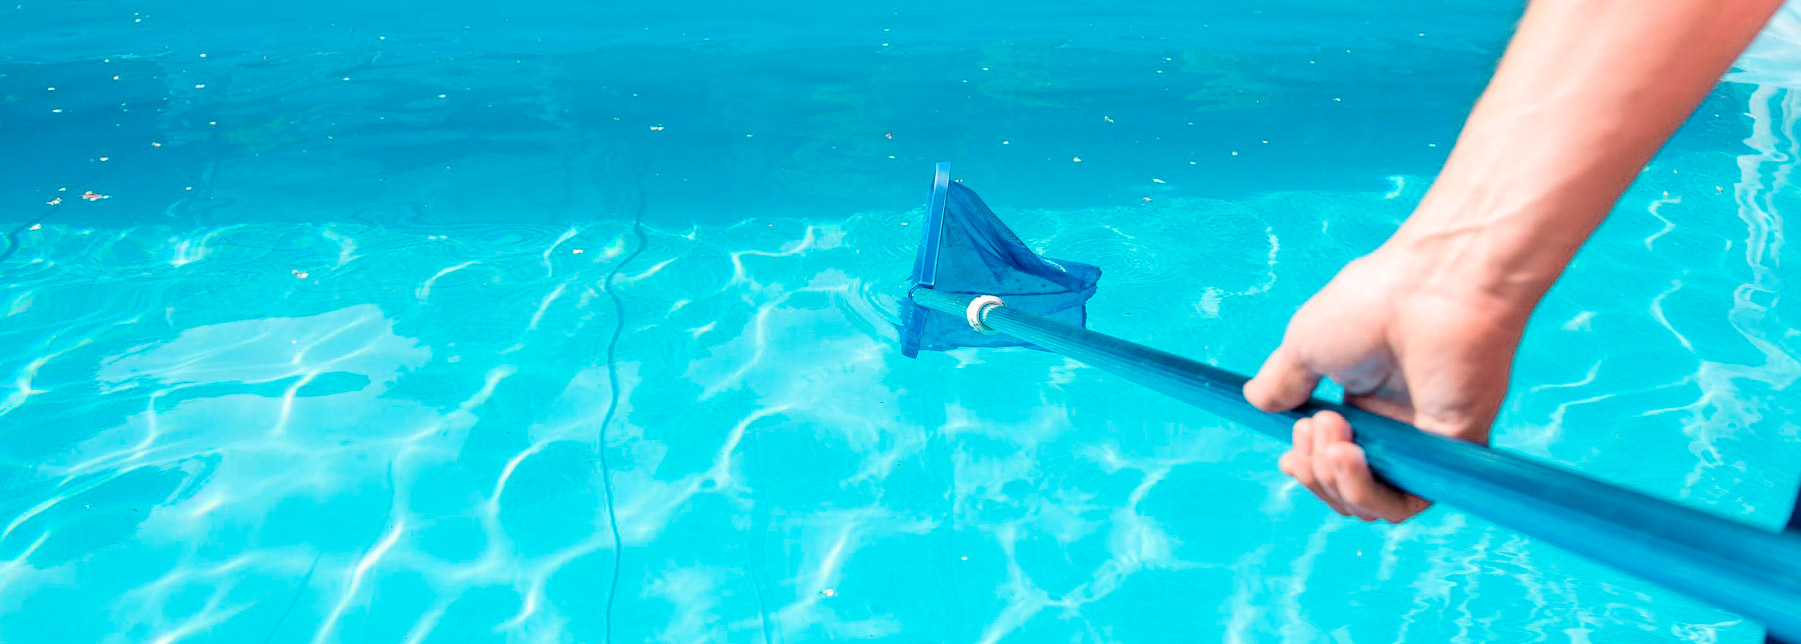 Aprenda a fazer a limpeza completa da sua piscina!